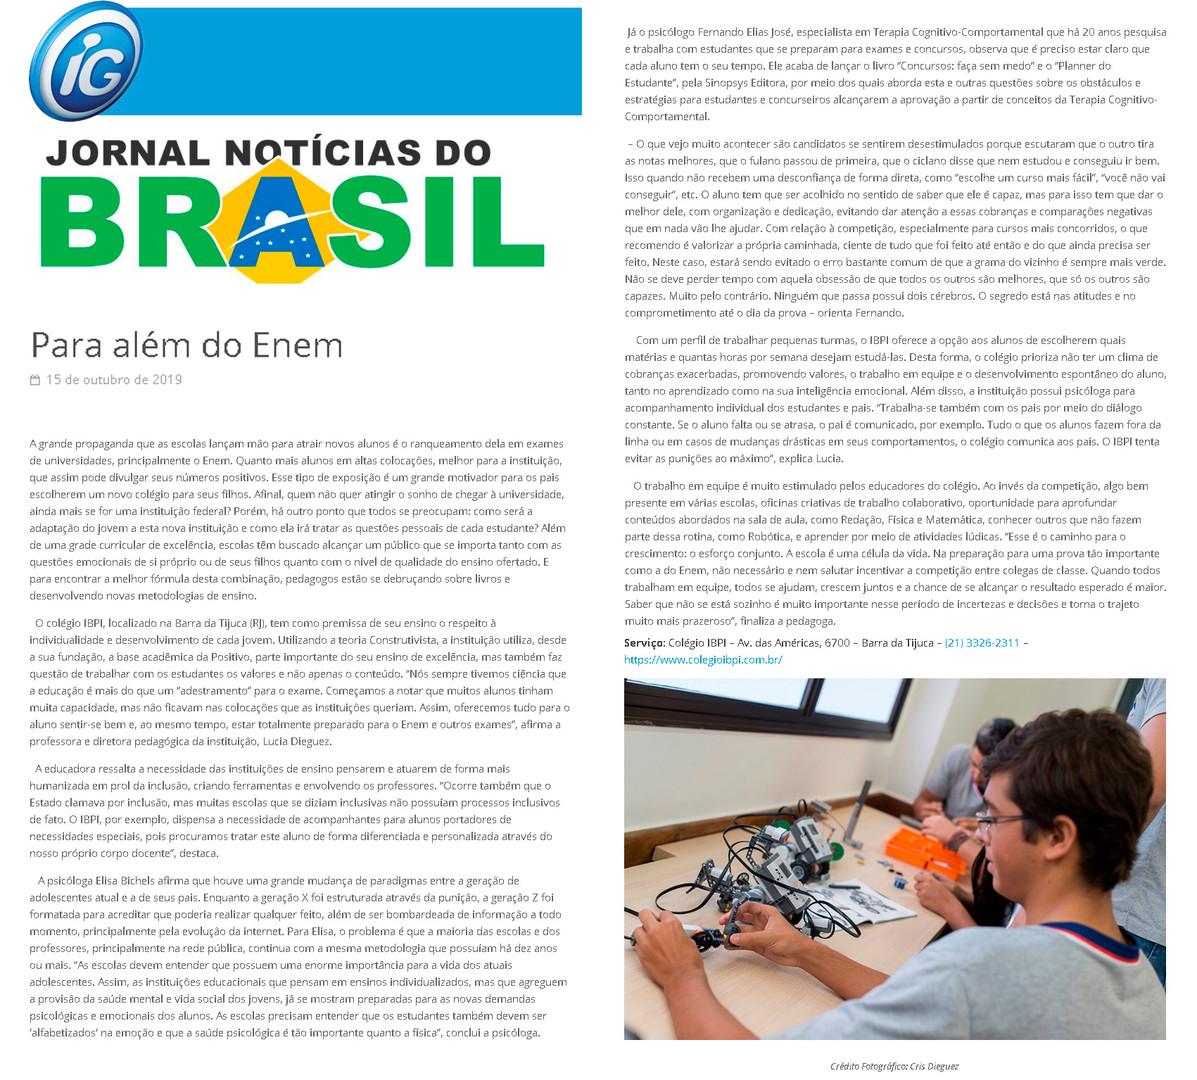 Portal IG - Jornal Notícias do Brasil